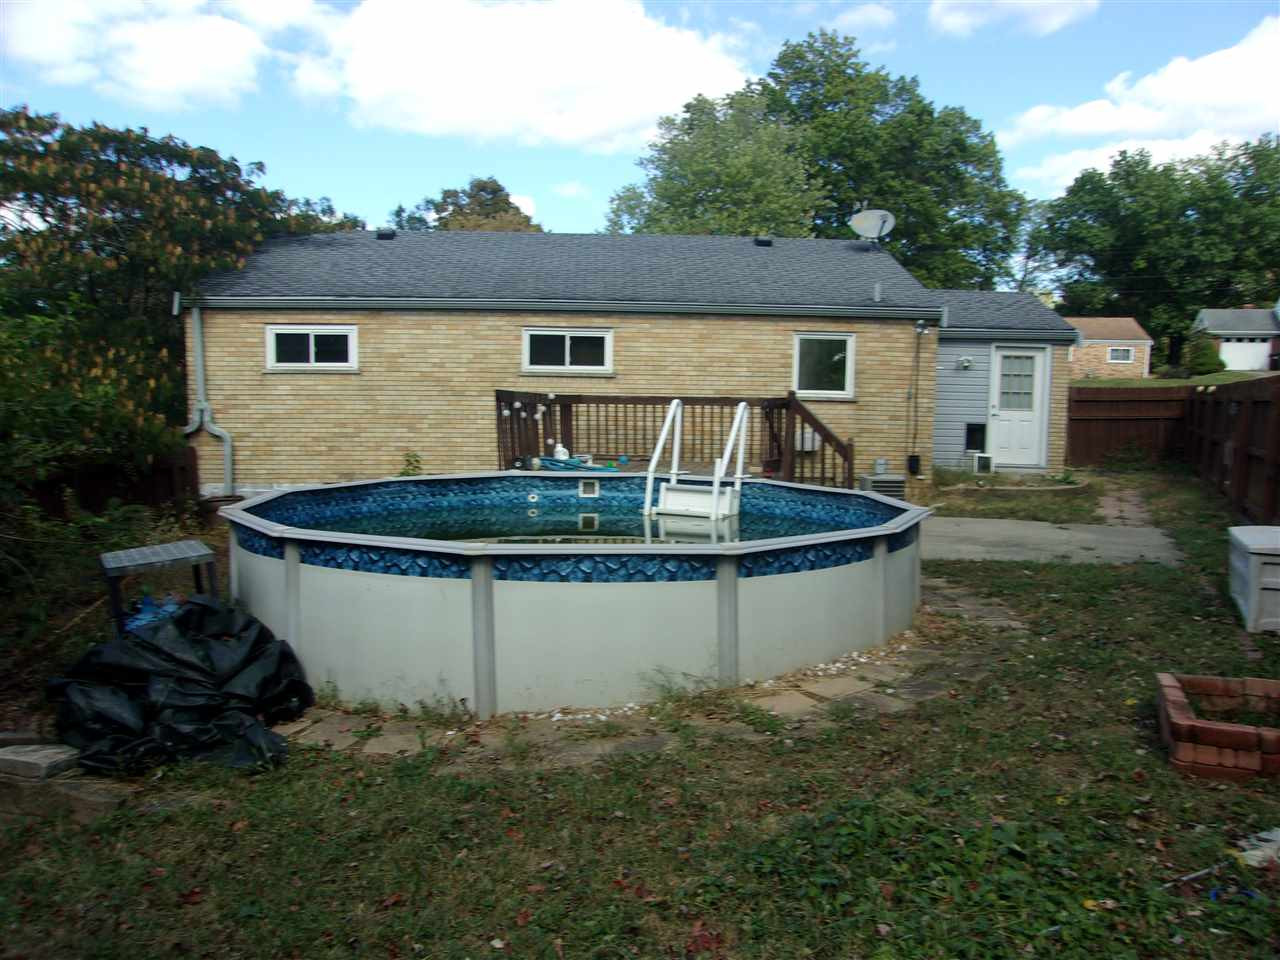 Photo 3 for 713 Saint Matthews Circle Taylor Mill, KY 41015